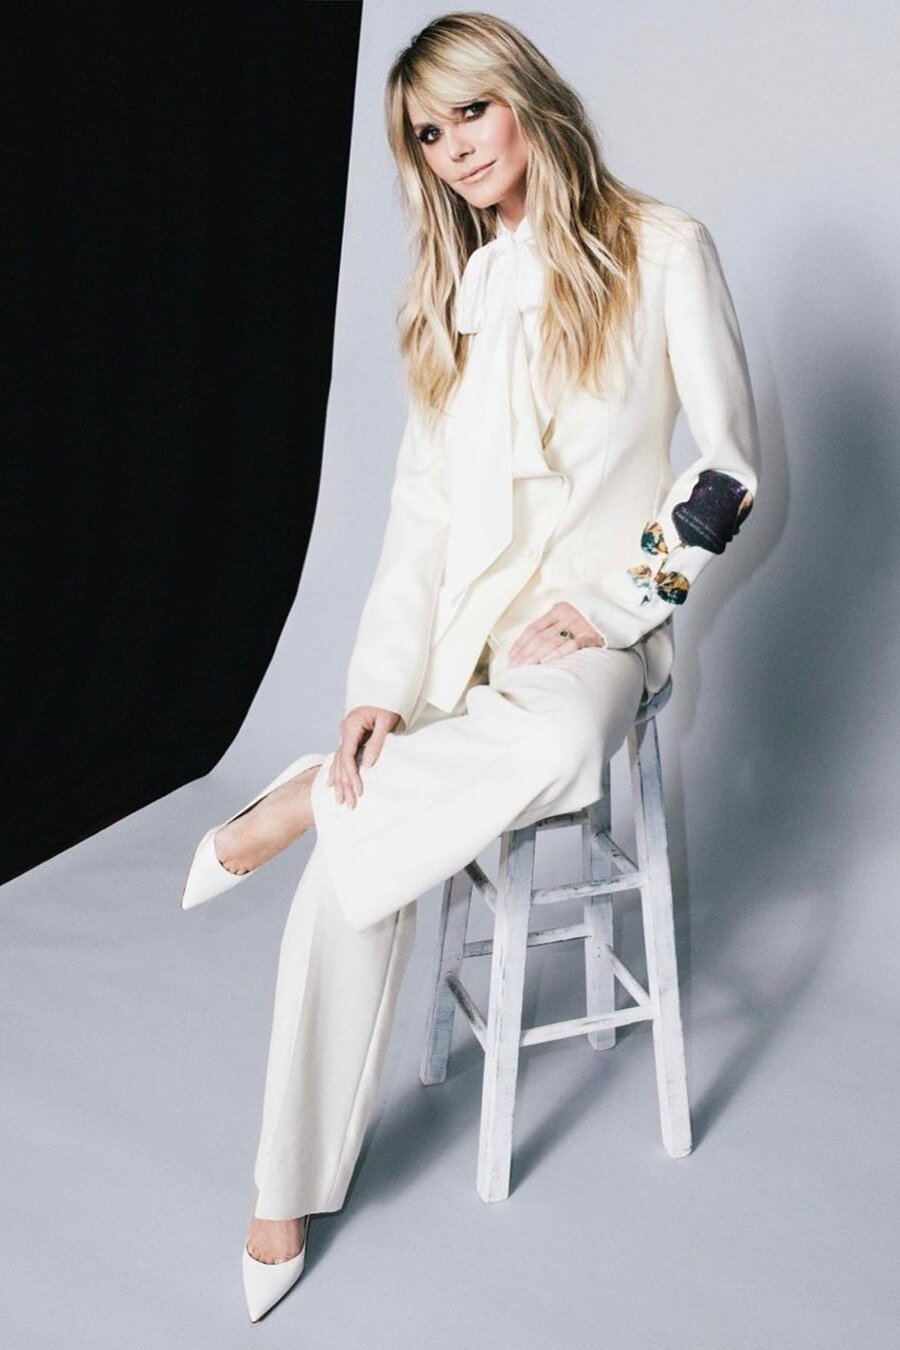 heidi-klum-making-the-cut-white-blazer.jpg